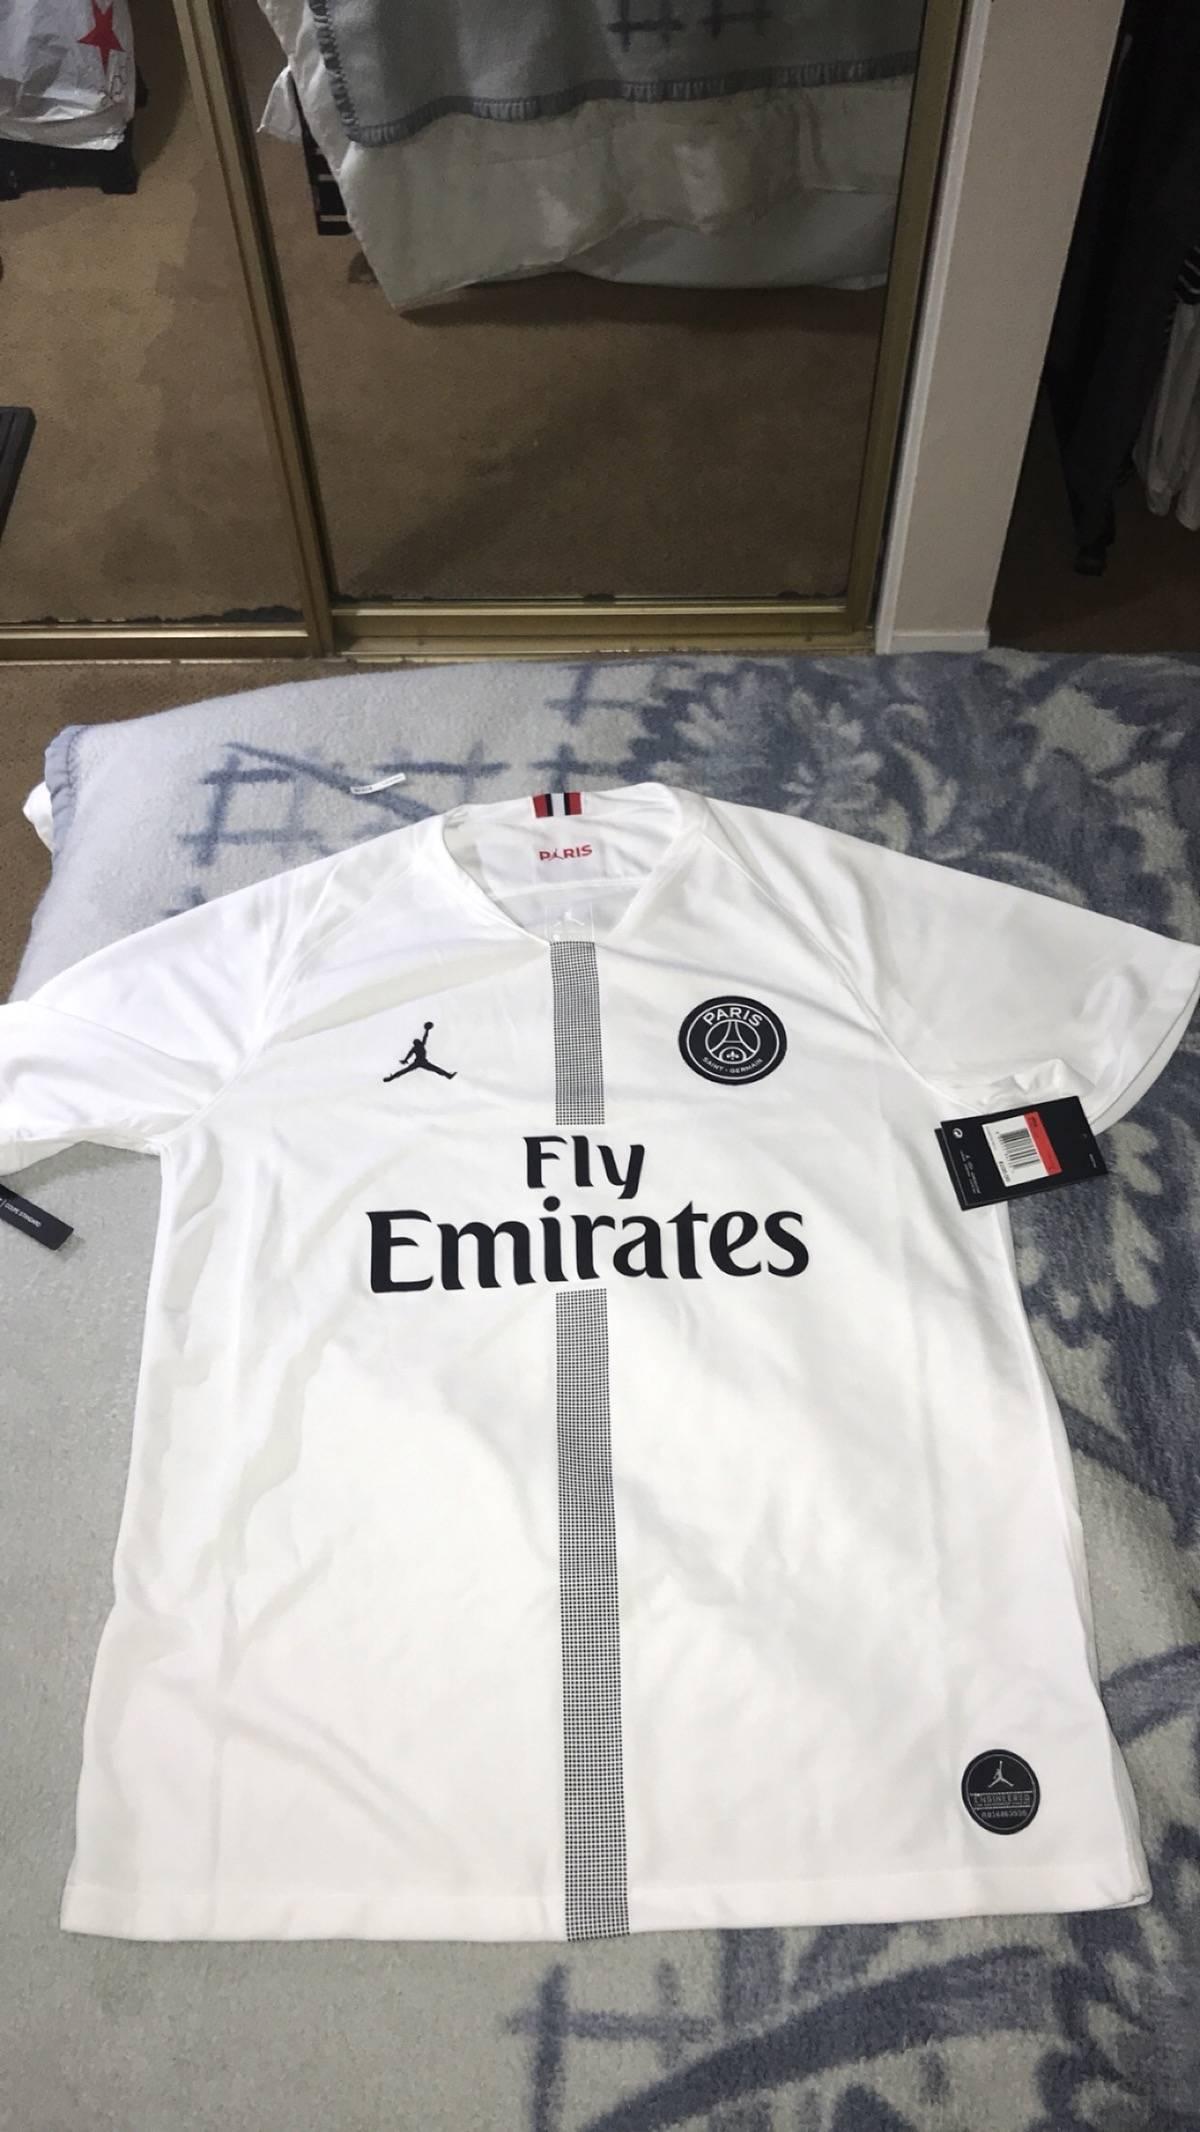 online retailer c36a8 d22fa Nike Nike Jordan Brand Psg Home White Jersey Neymar Jr. Messi Supreme Bape  Palace Kith Size L $81